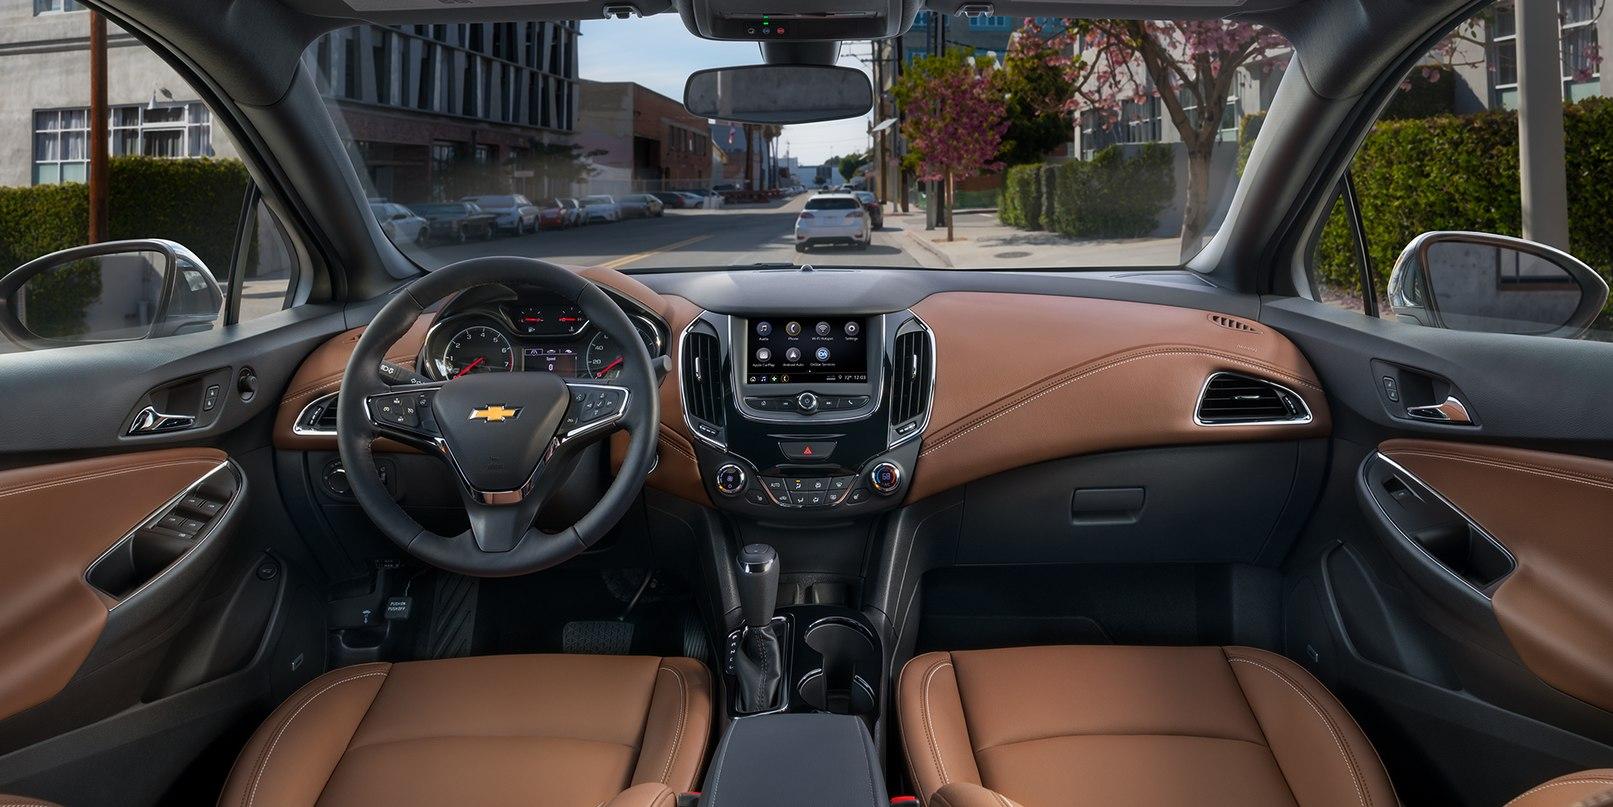 Interior of the 2019 Chevrolet Cruze